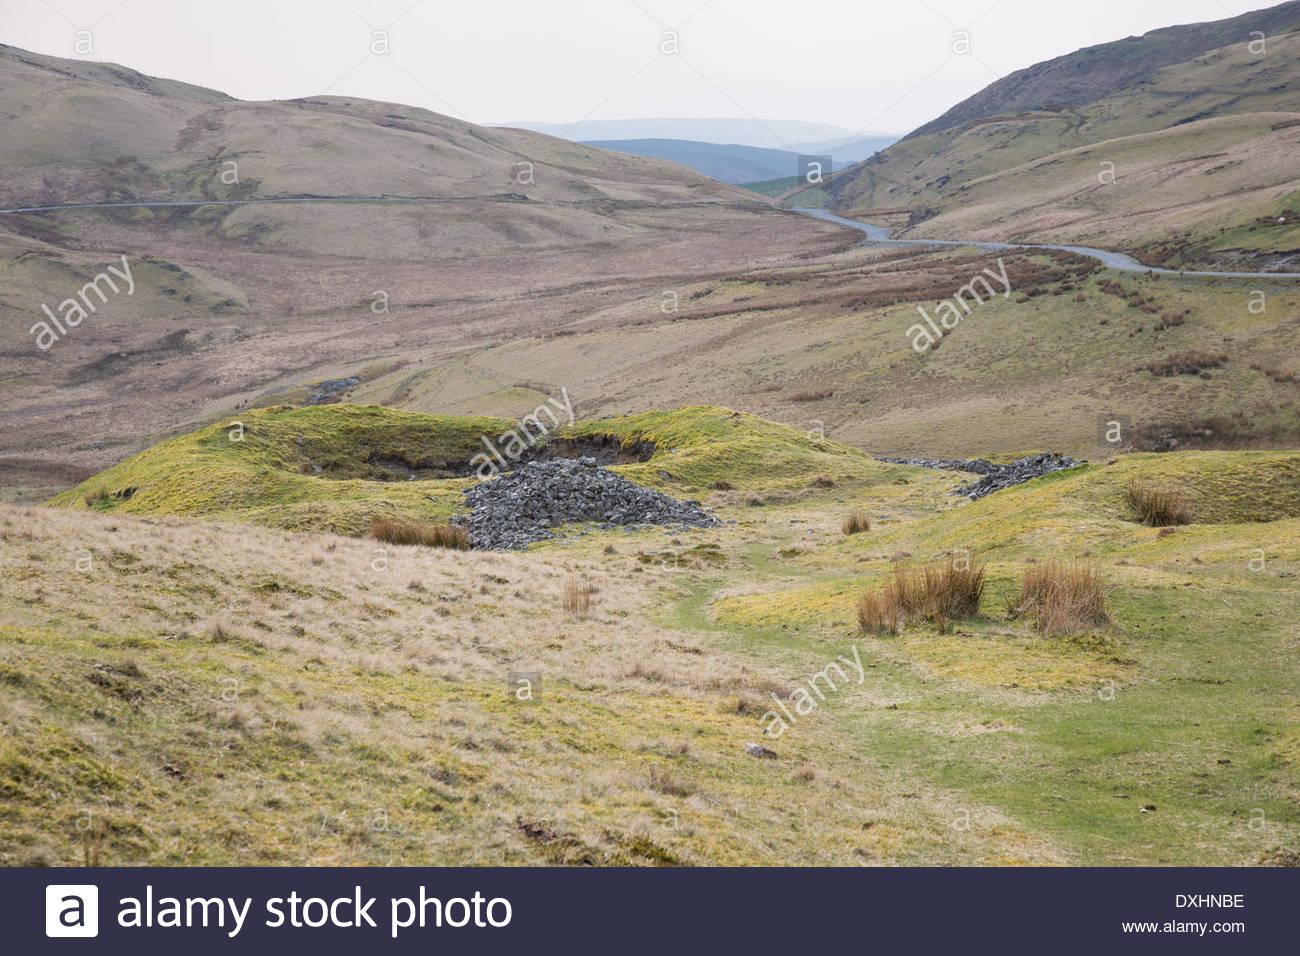 Derelict abandoned silver lead mine workings, shaft, Pumlumon mountain range in mid Wales - Stock Image